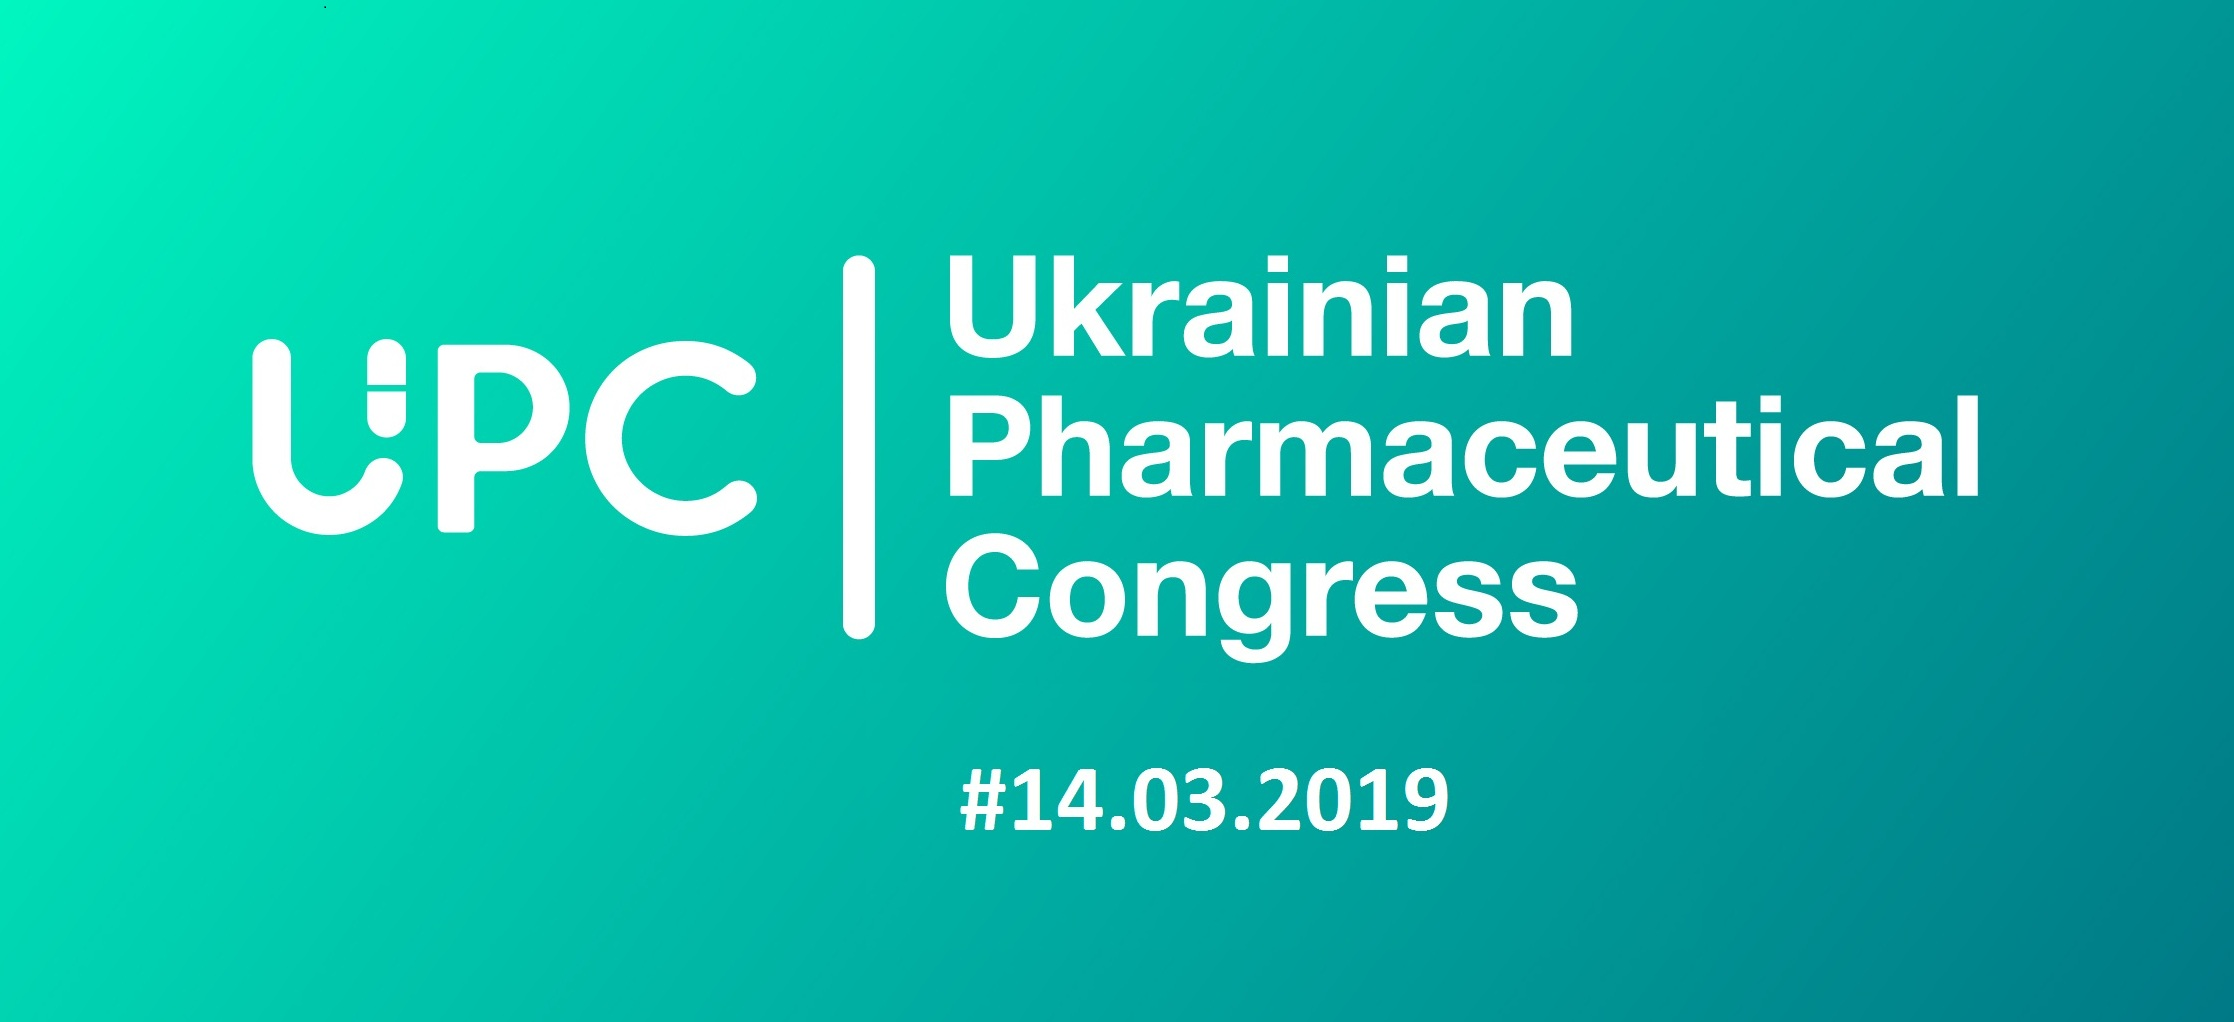 14 березня Image: Ukrainian Pharmaceutical Congress 2019: 14 березня 2019